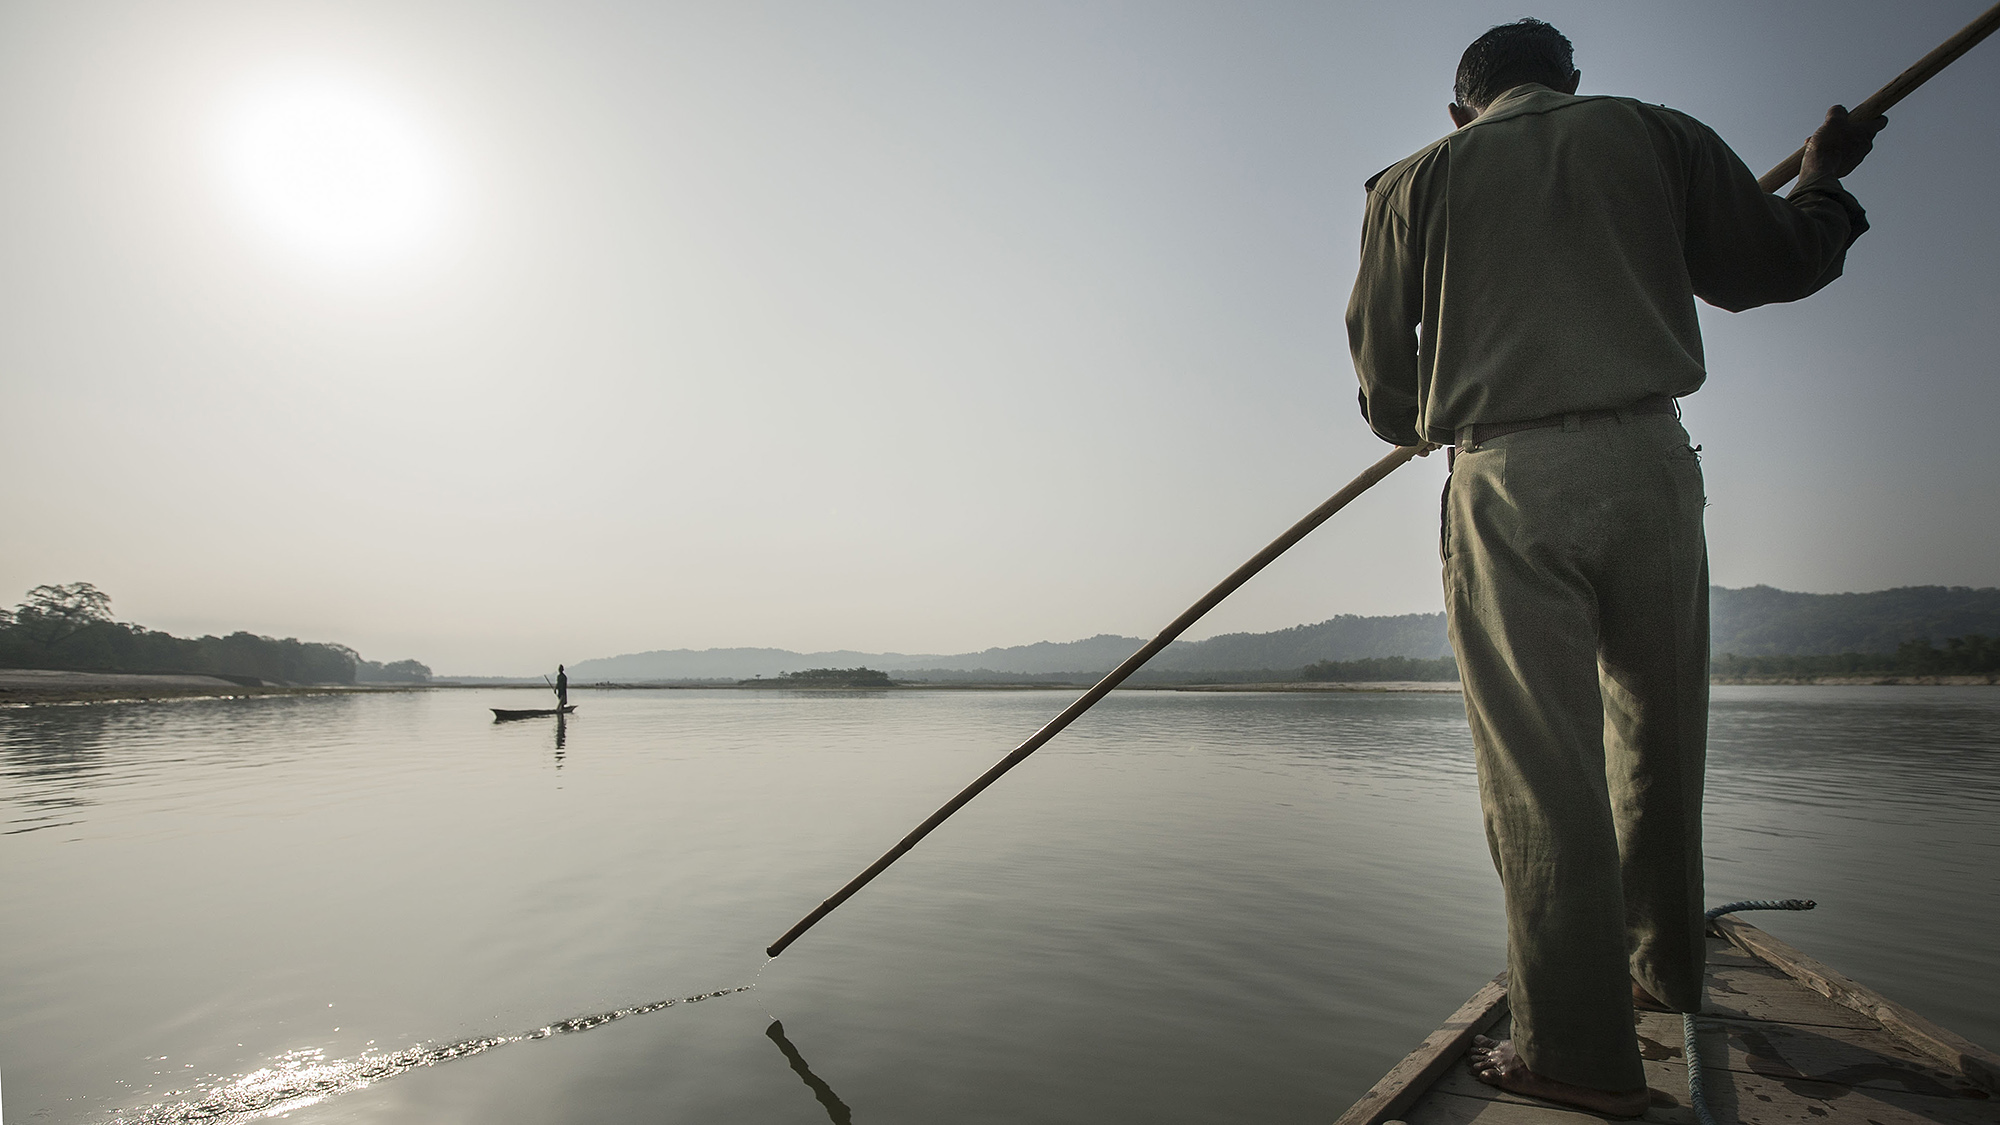 Crossing the Seti Gandaki River